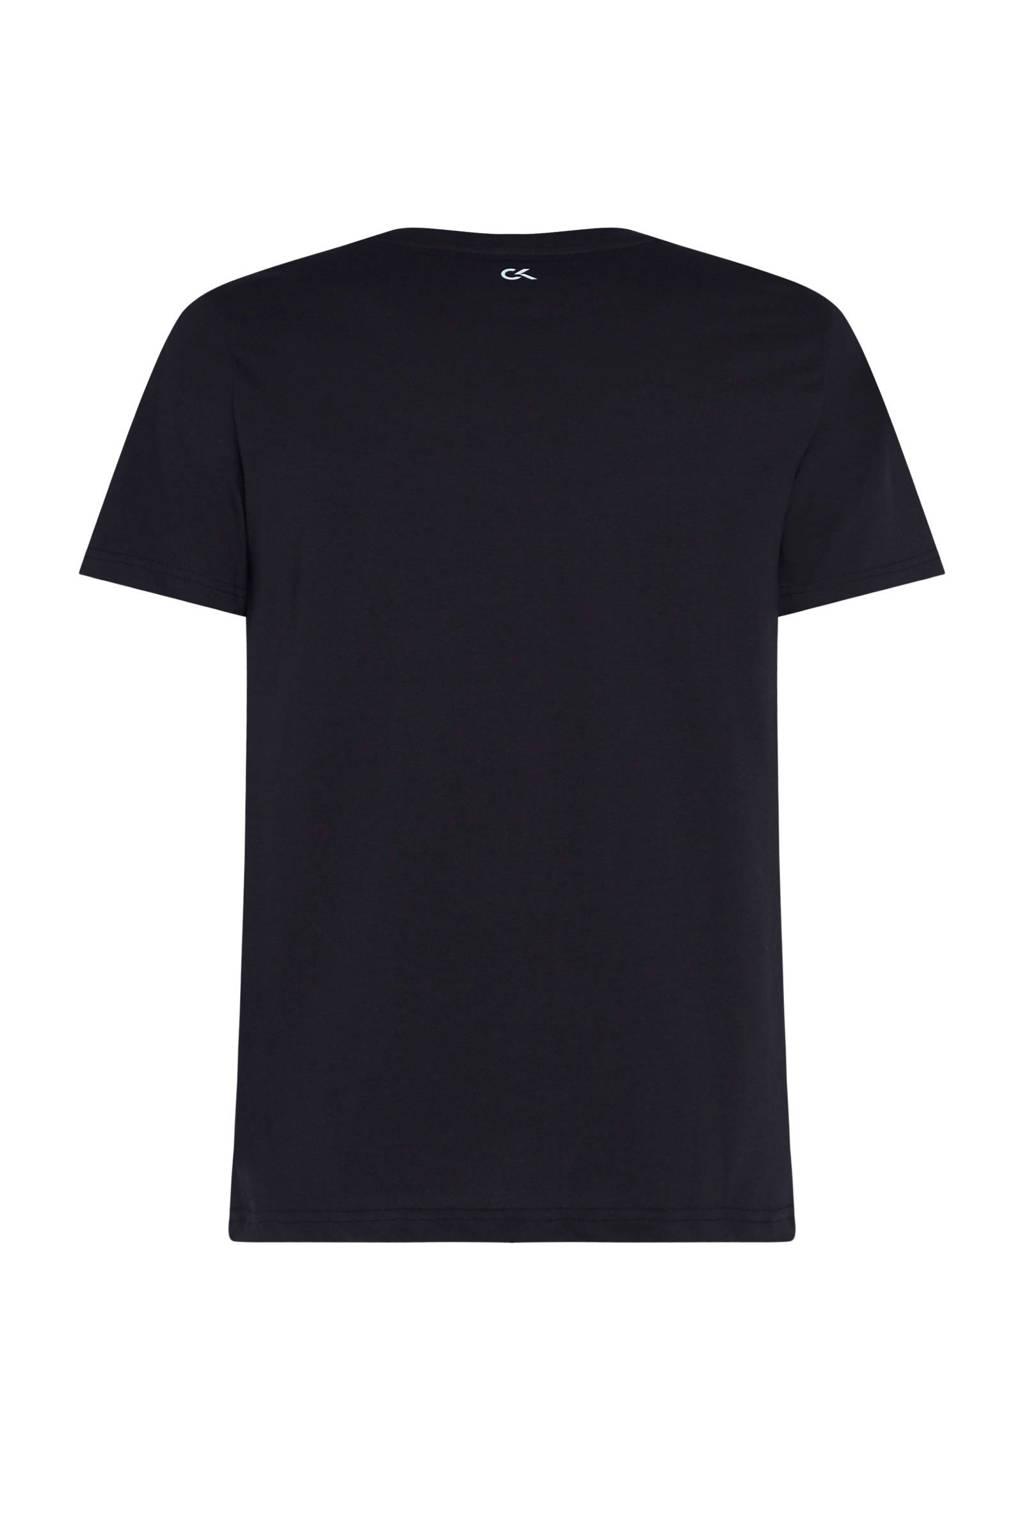 CALVIN KLEIN PERFORMANCE   sport T-shirt zwart/wit, Zwart